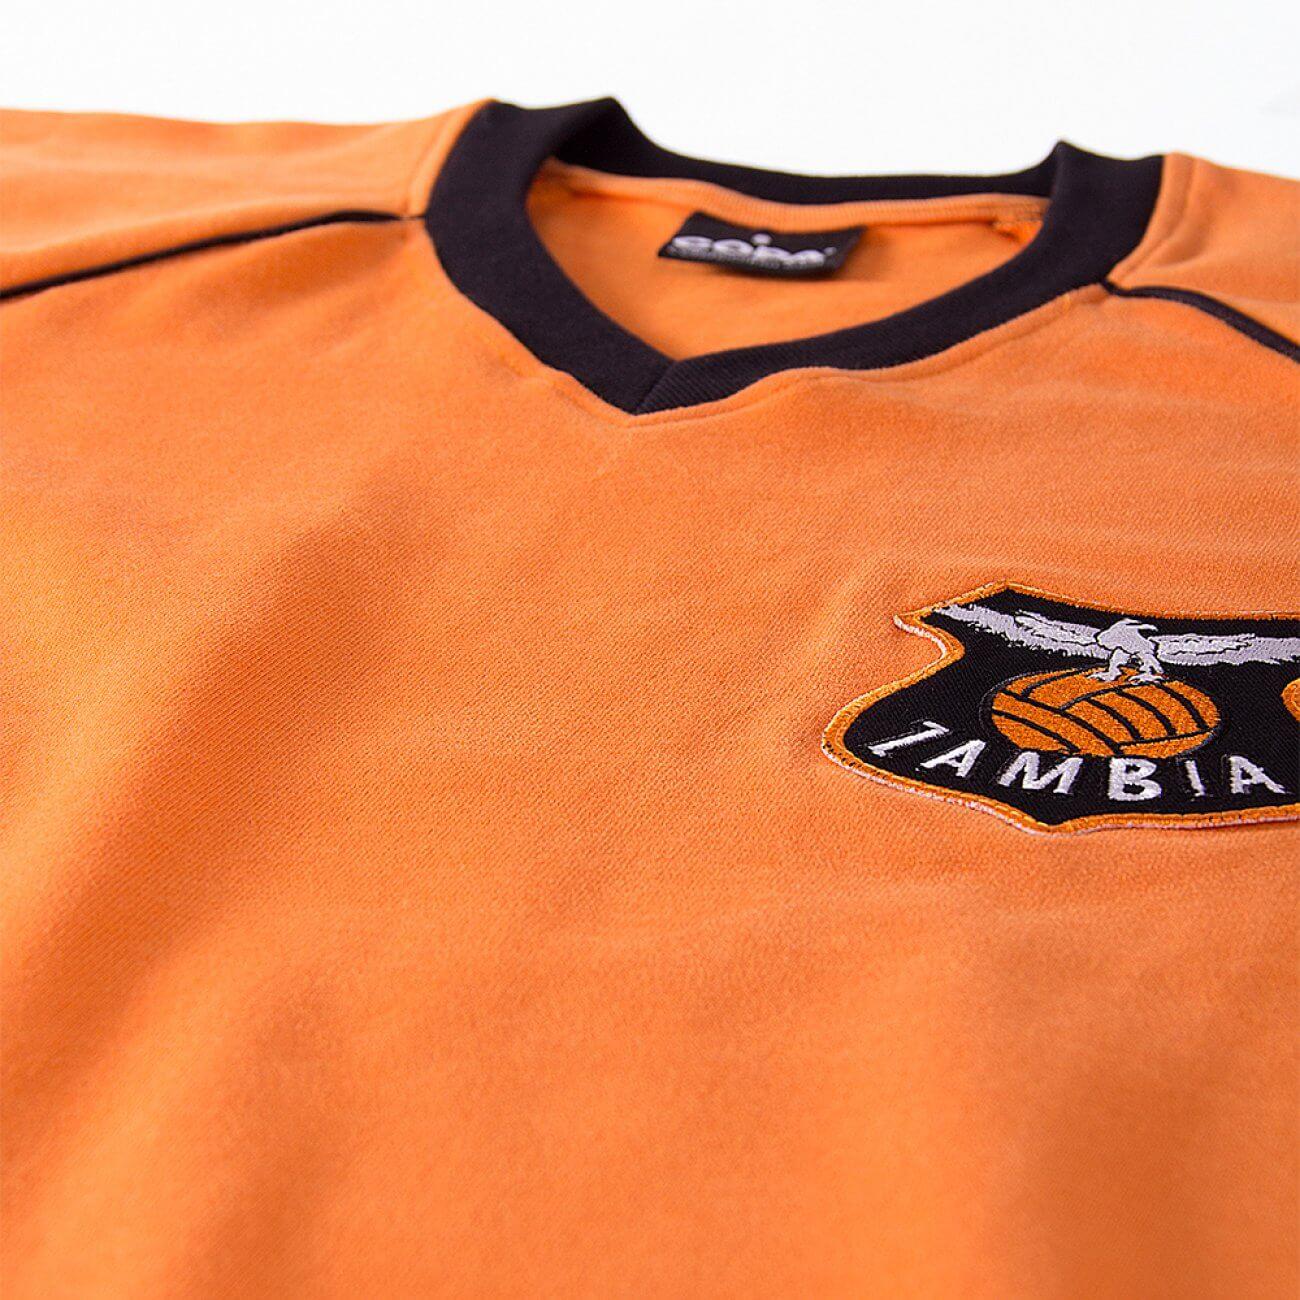 e1e01d7a1 Zambia Vintage football shirt 1980's   Retrofootball®